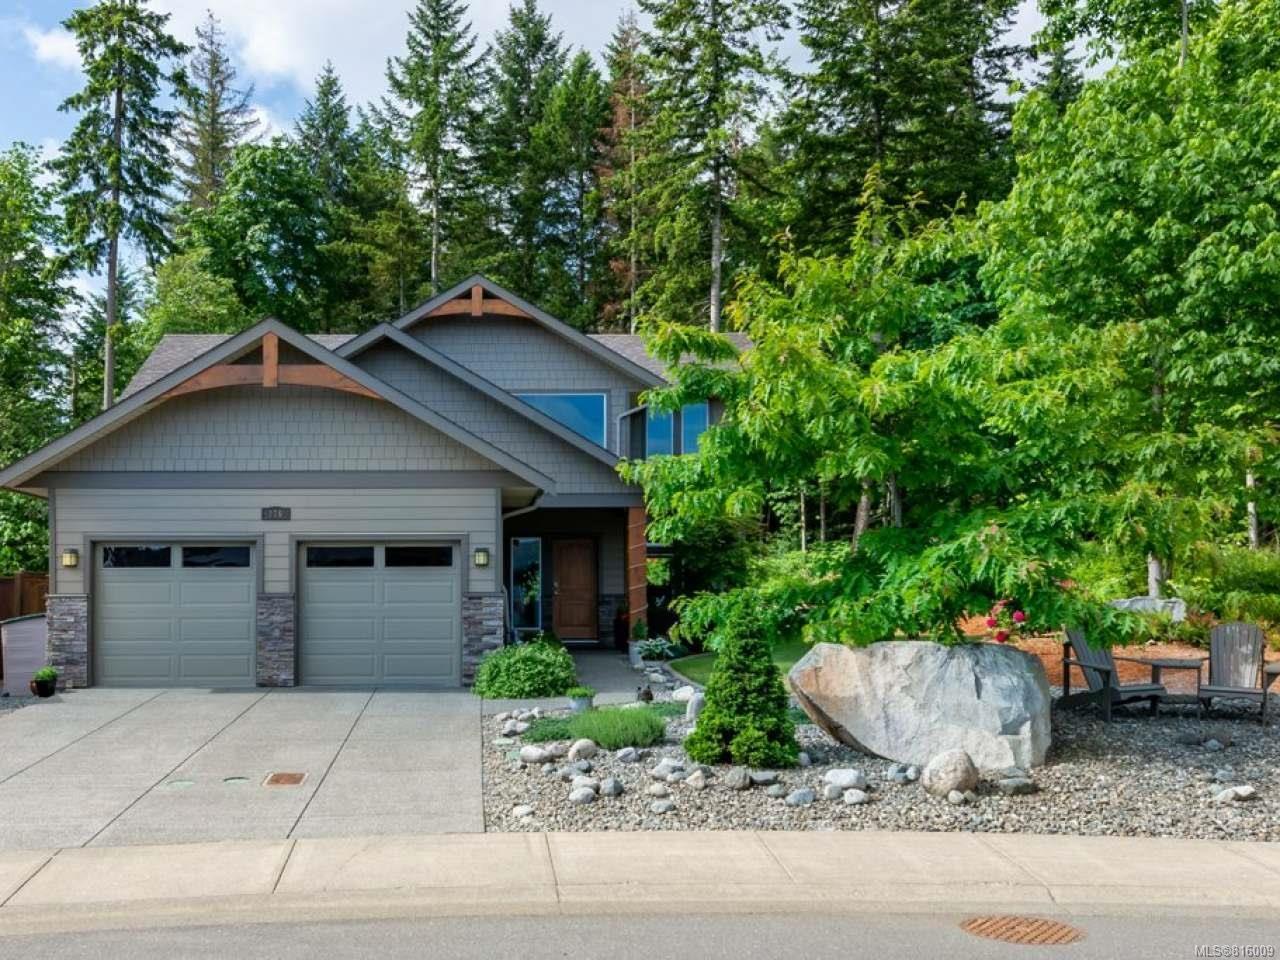 Main Photo: 116 303 Arden Rd in COURTENAY: CV Courtenay City House for sale (Comox Valley)  : MLS®# 816009